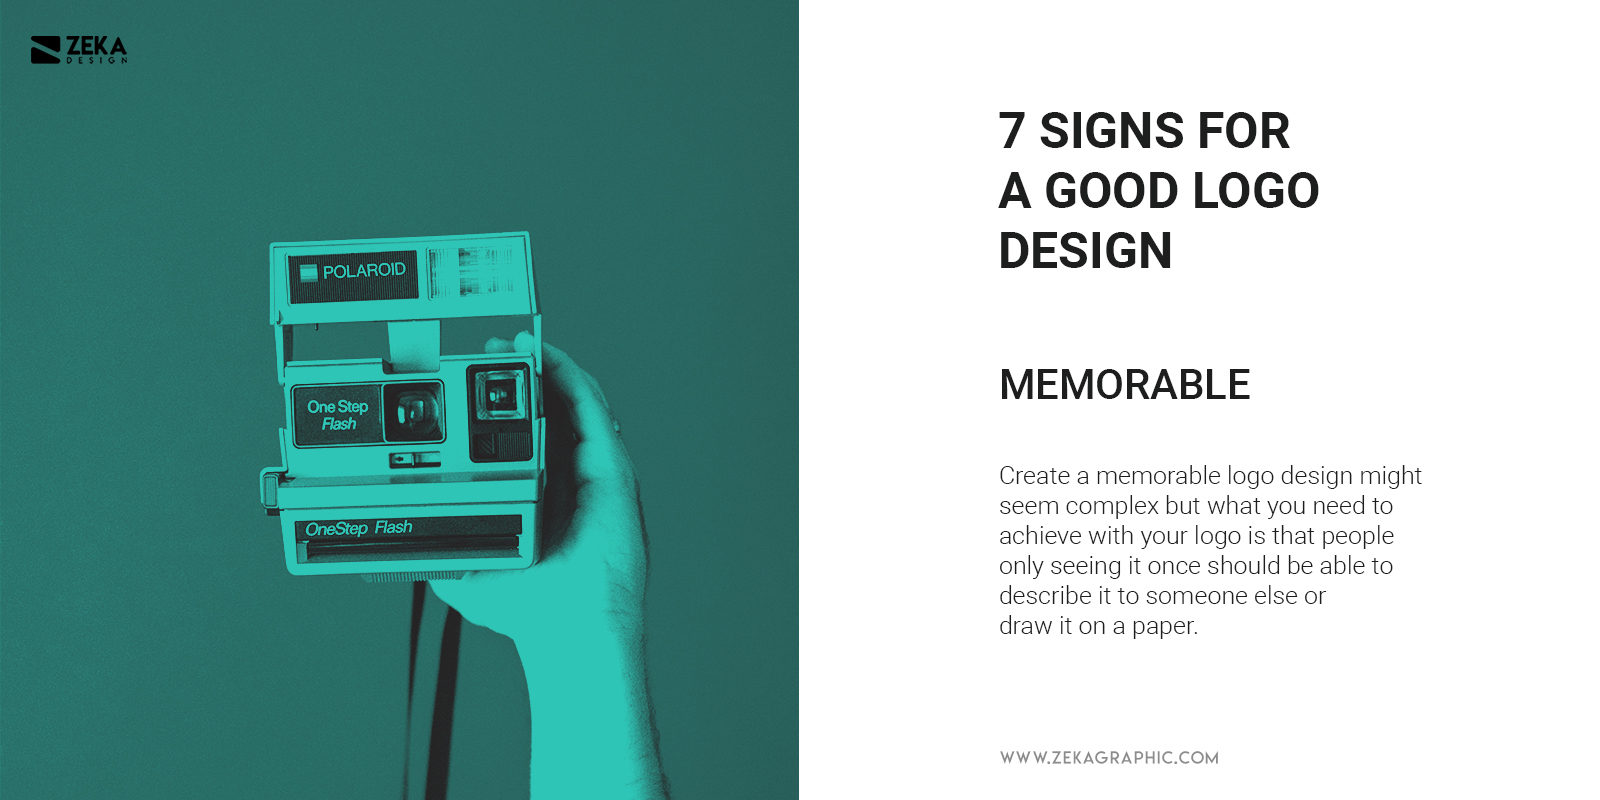 Memorable Logo Design Quality What Makes Good Logo Design